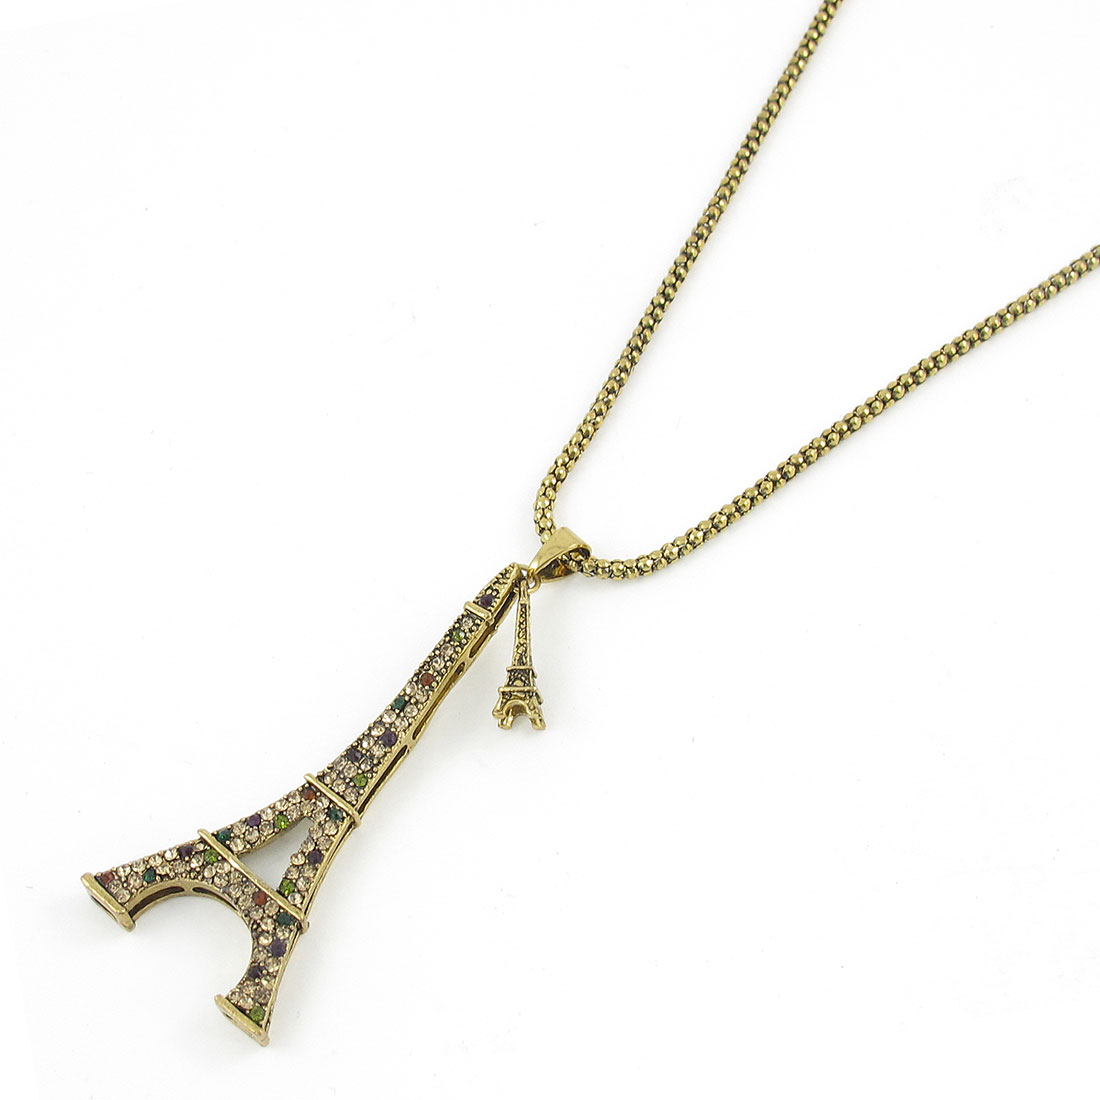 Gold Tone Metal Tower Pendant Necklace Neck Ornament for Women Men